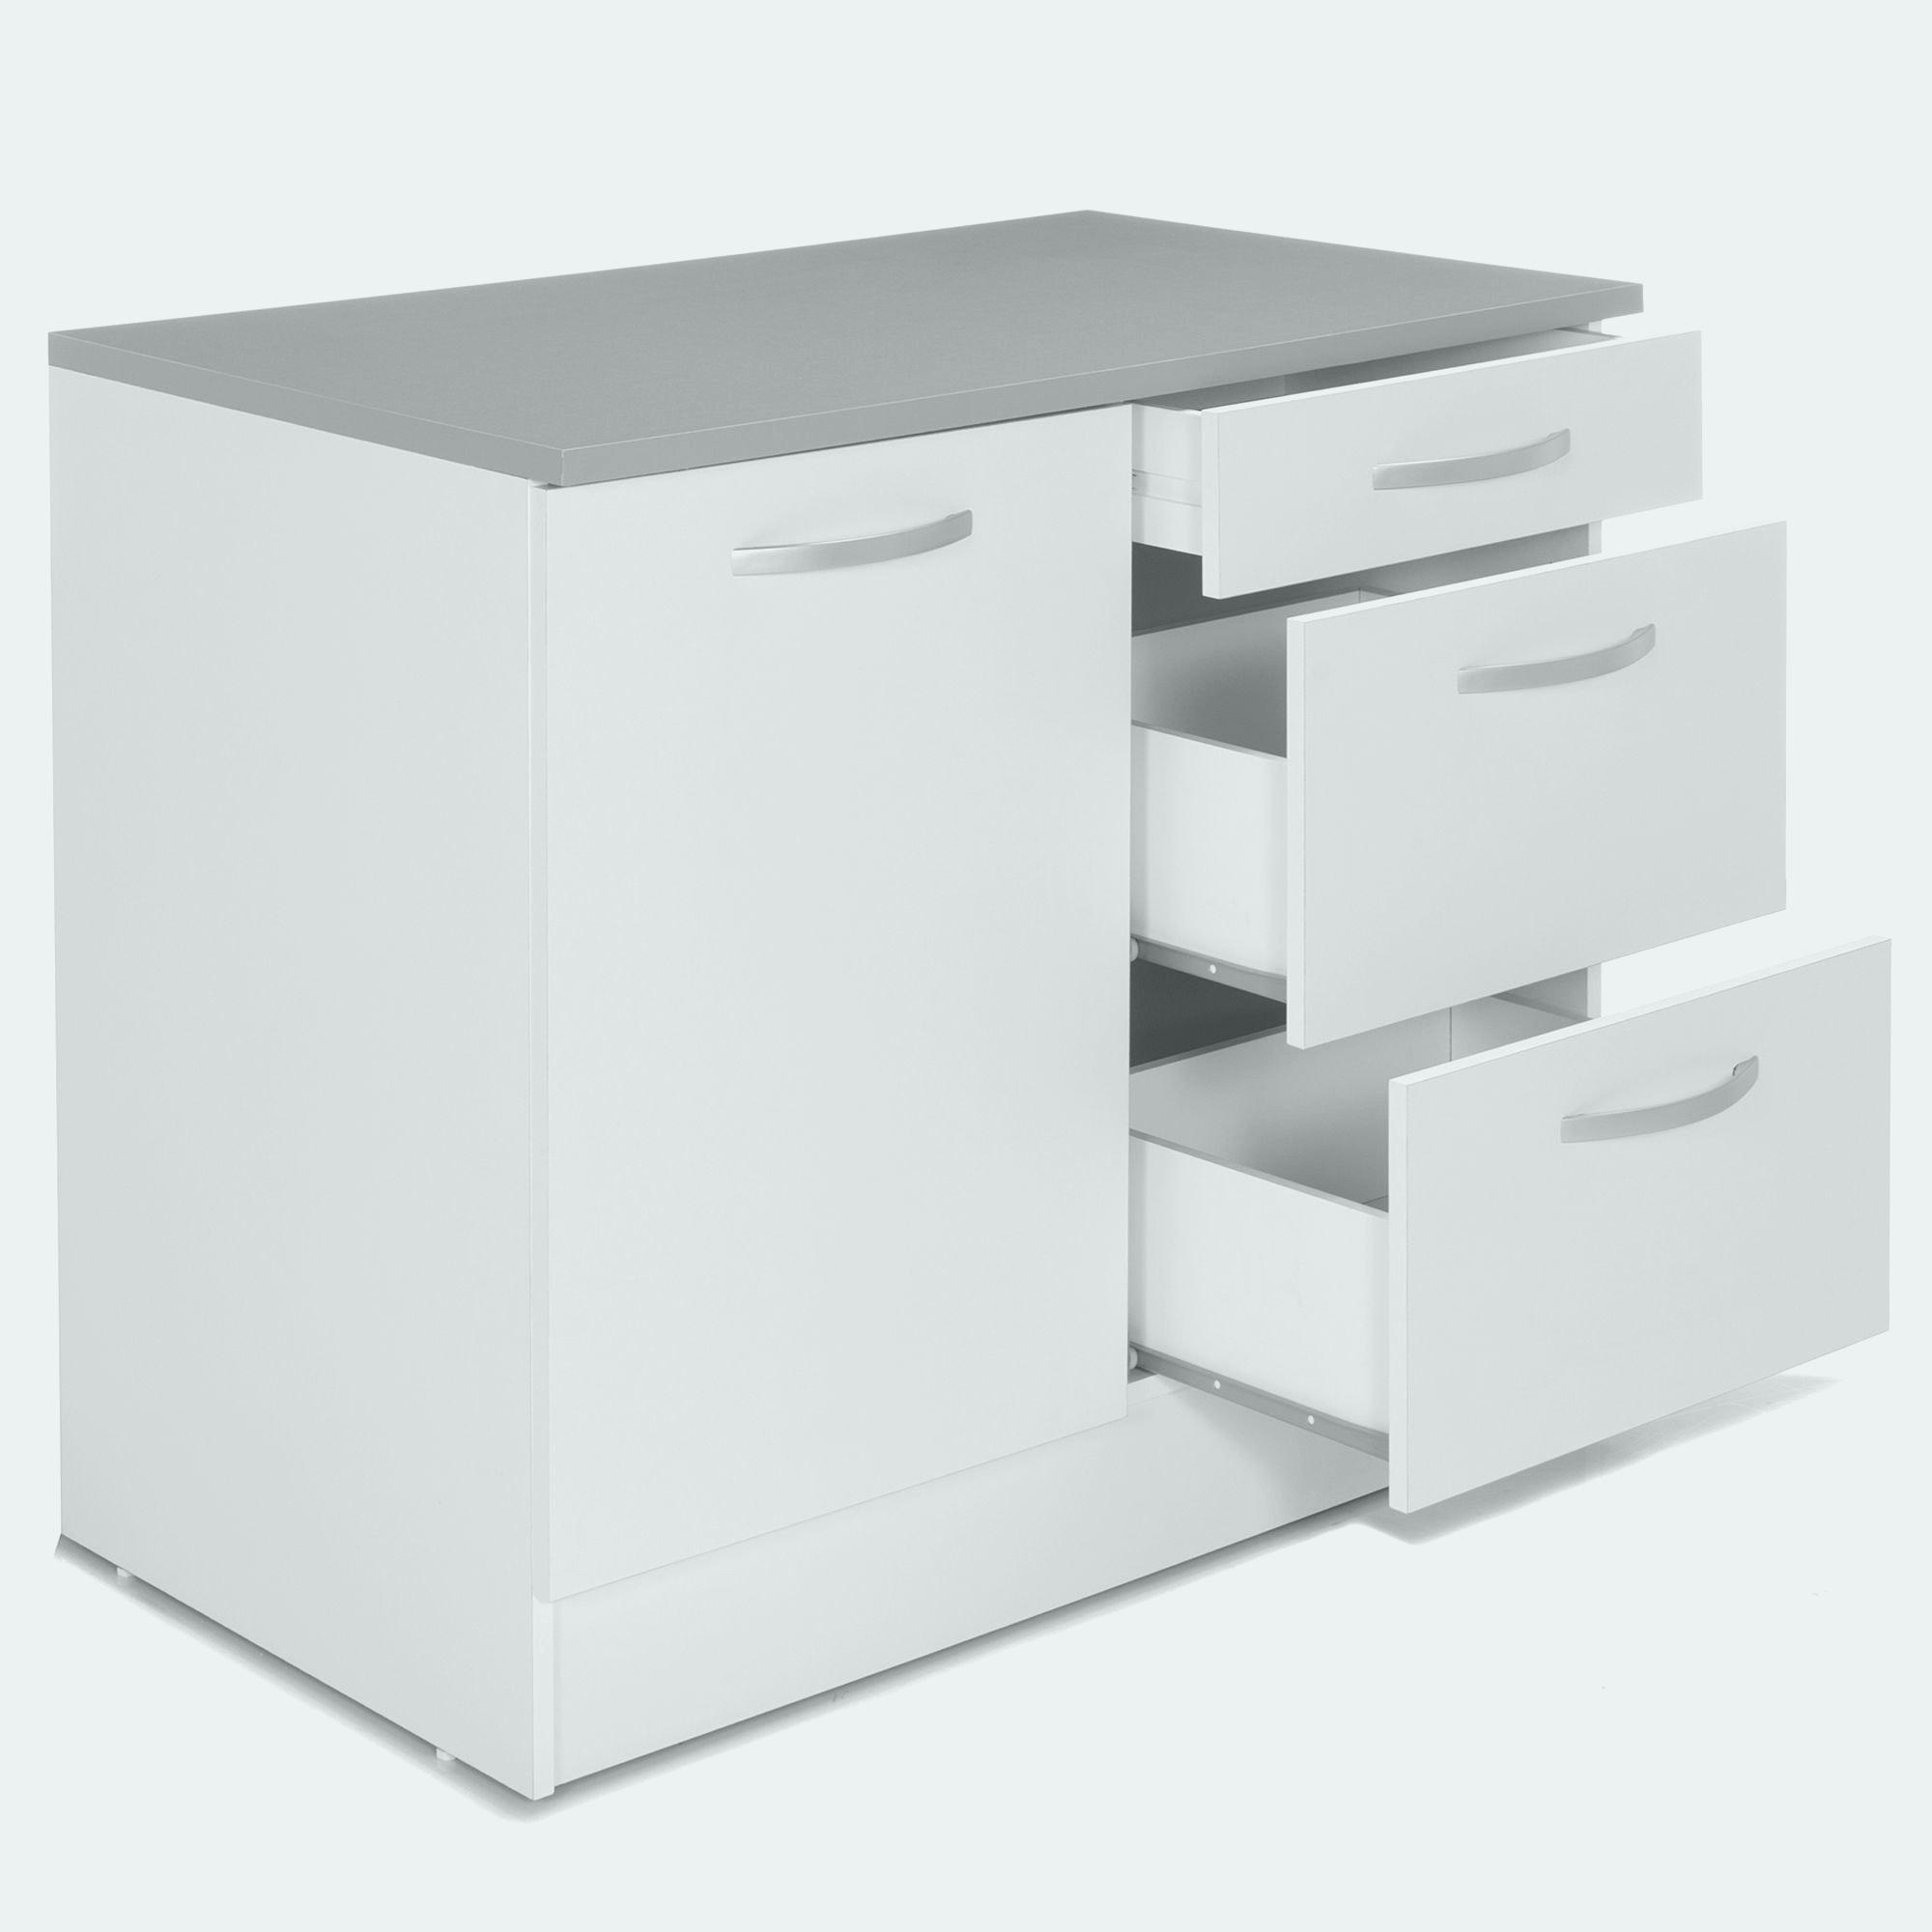 Ikea Meuble Bas Cuisine 120 Cm Avec Plan De Travail pour Meuble Bas Cuisine 50 Cm Largeur Ikea